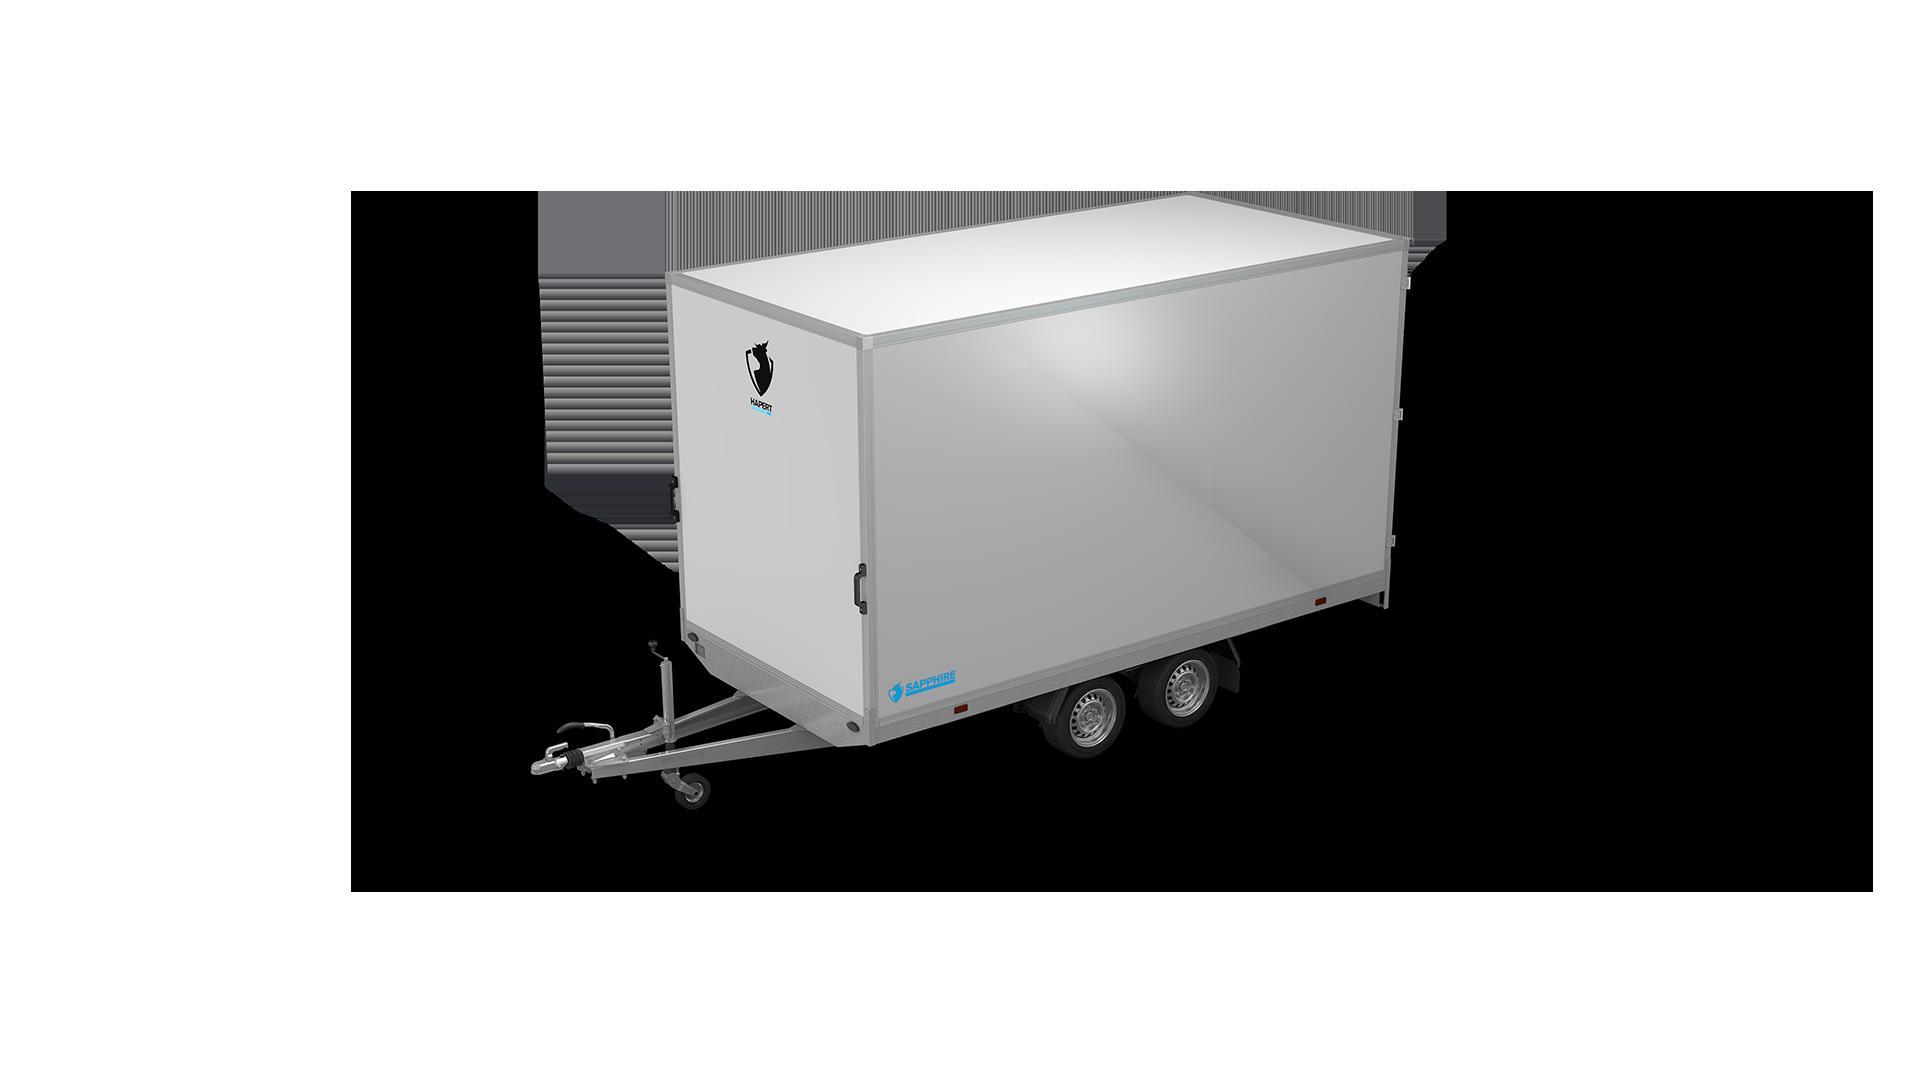 HAPERT box van trailer SAPPHIRE H-2